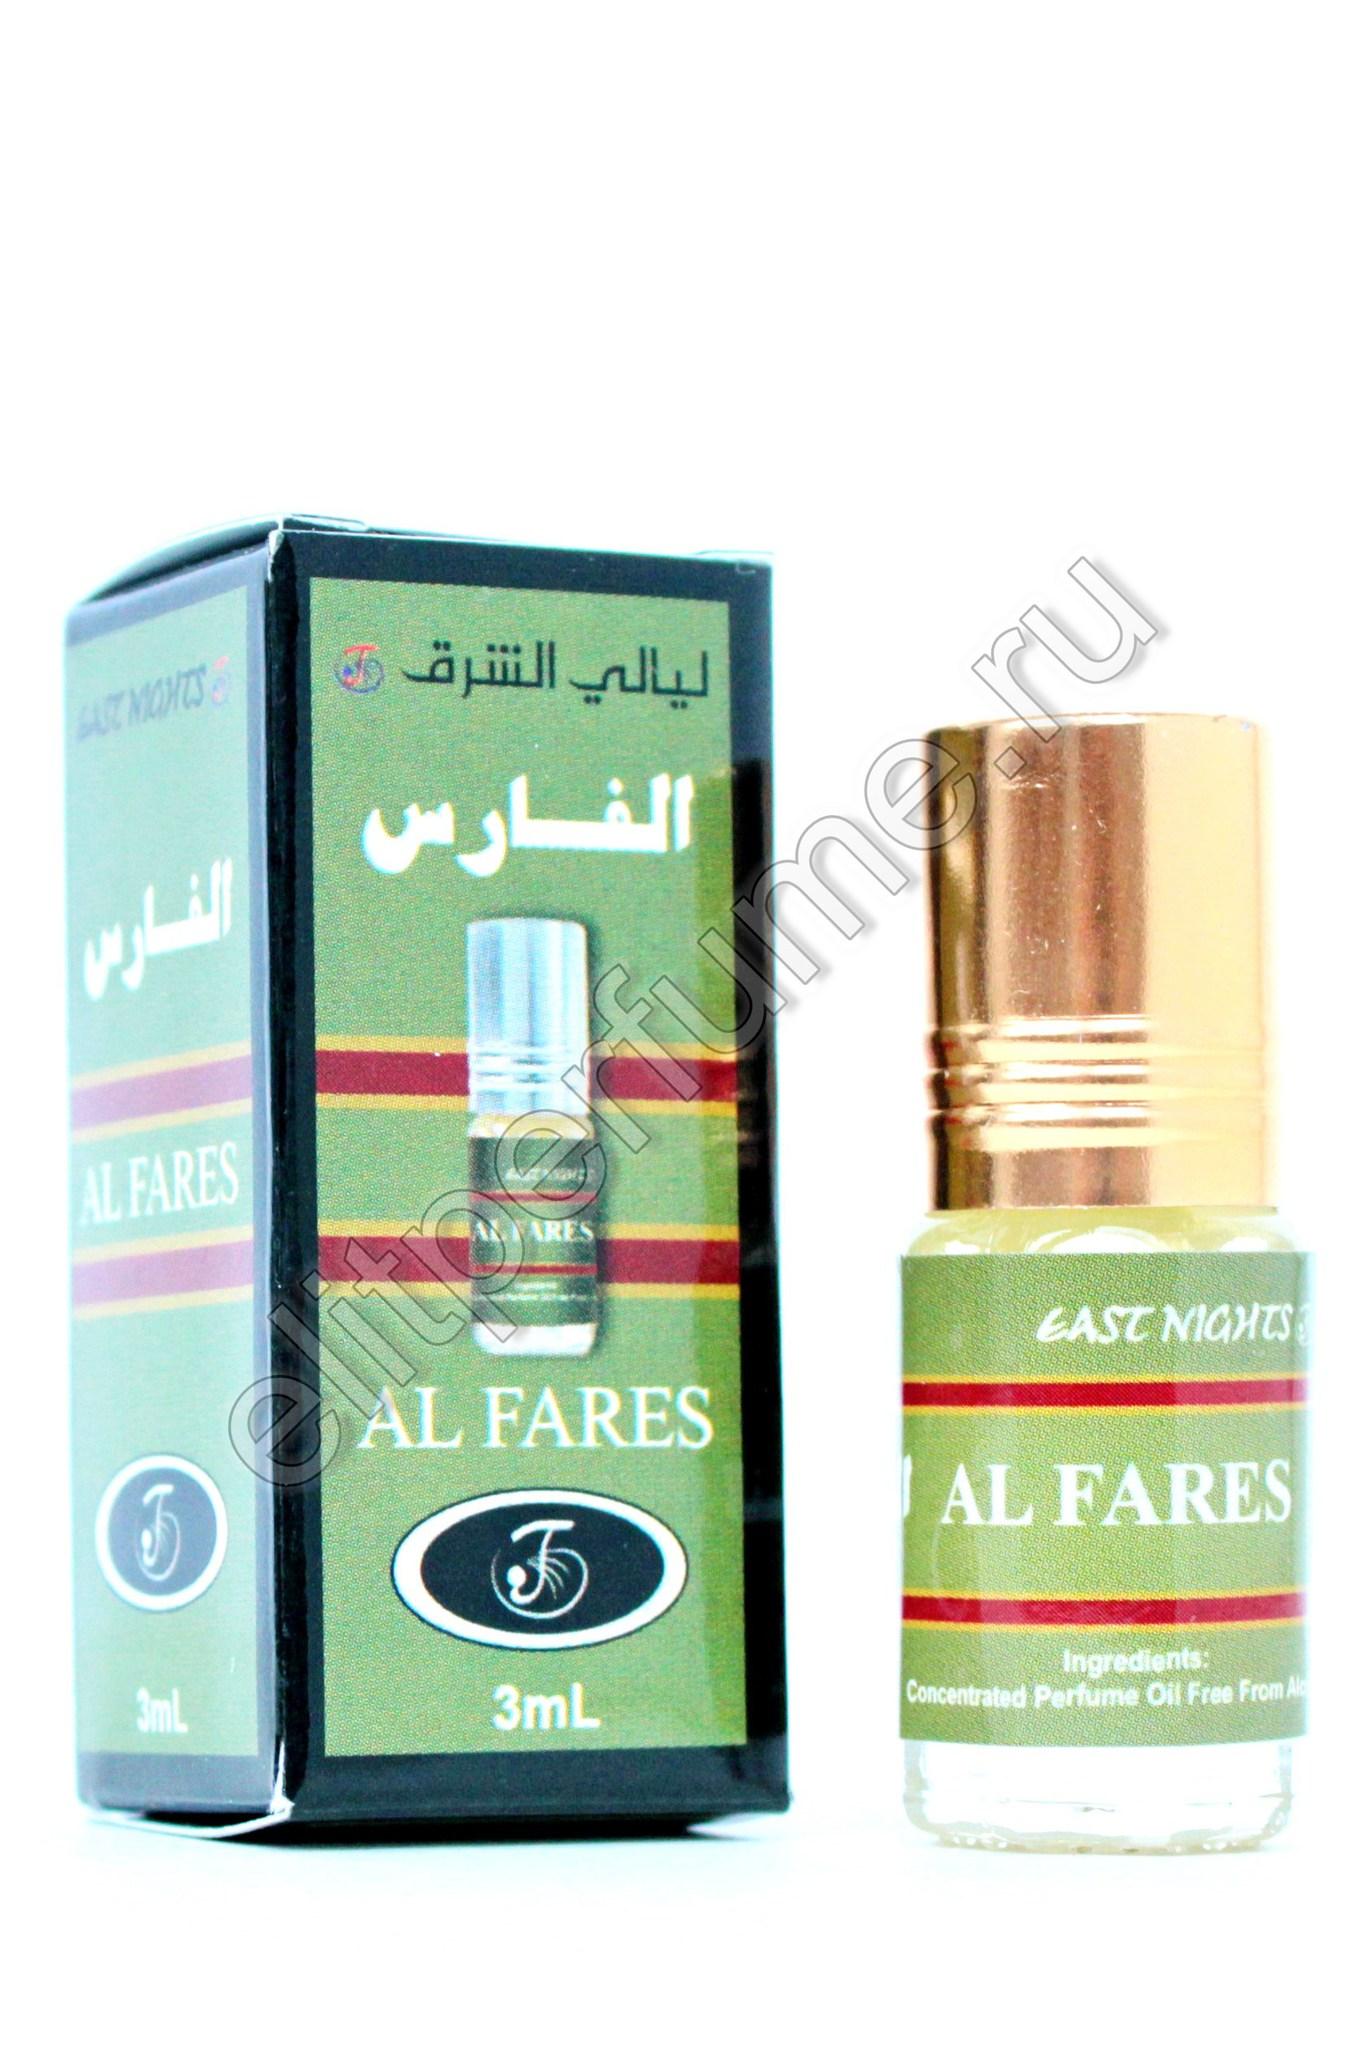 Al Fares Аль Фарес 3 мл арабские масляные духи от East Nights